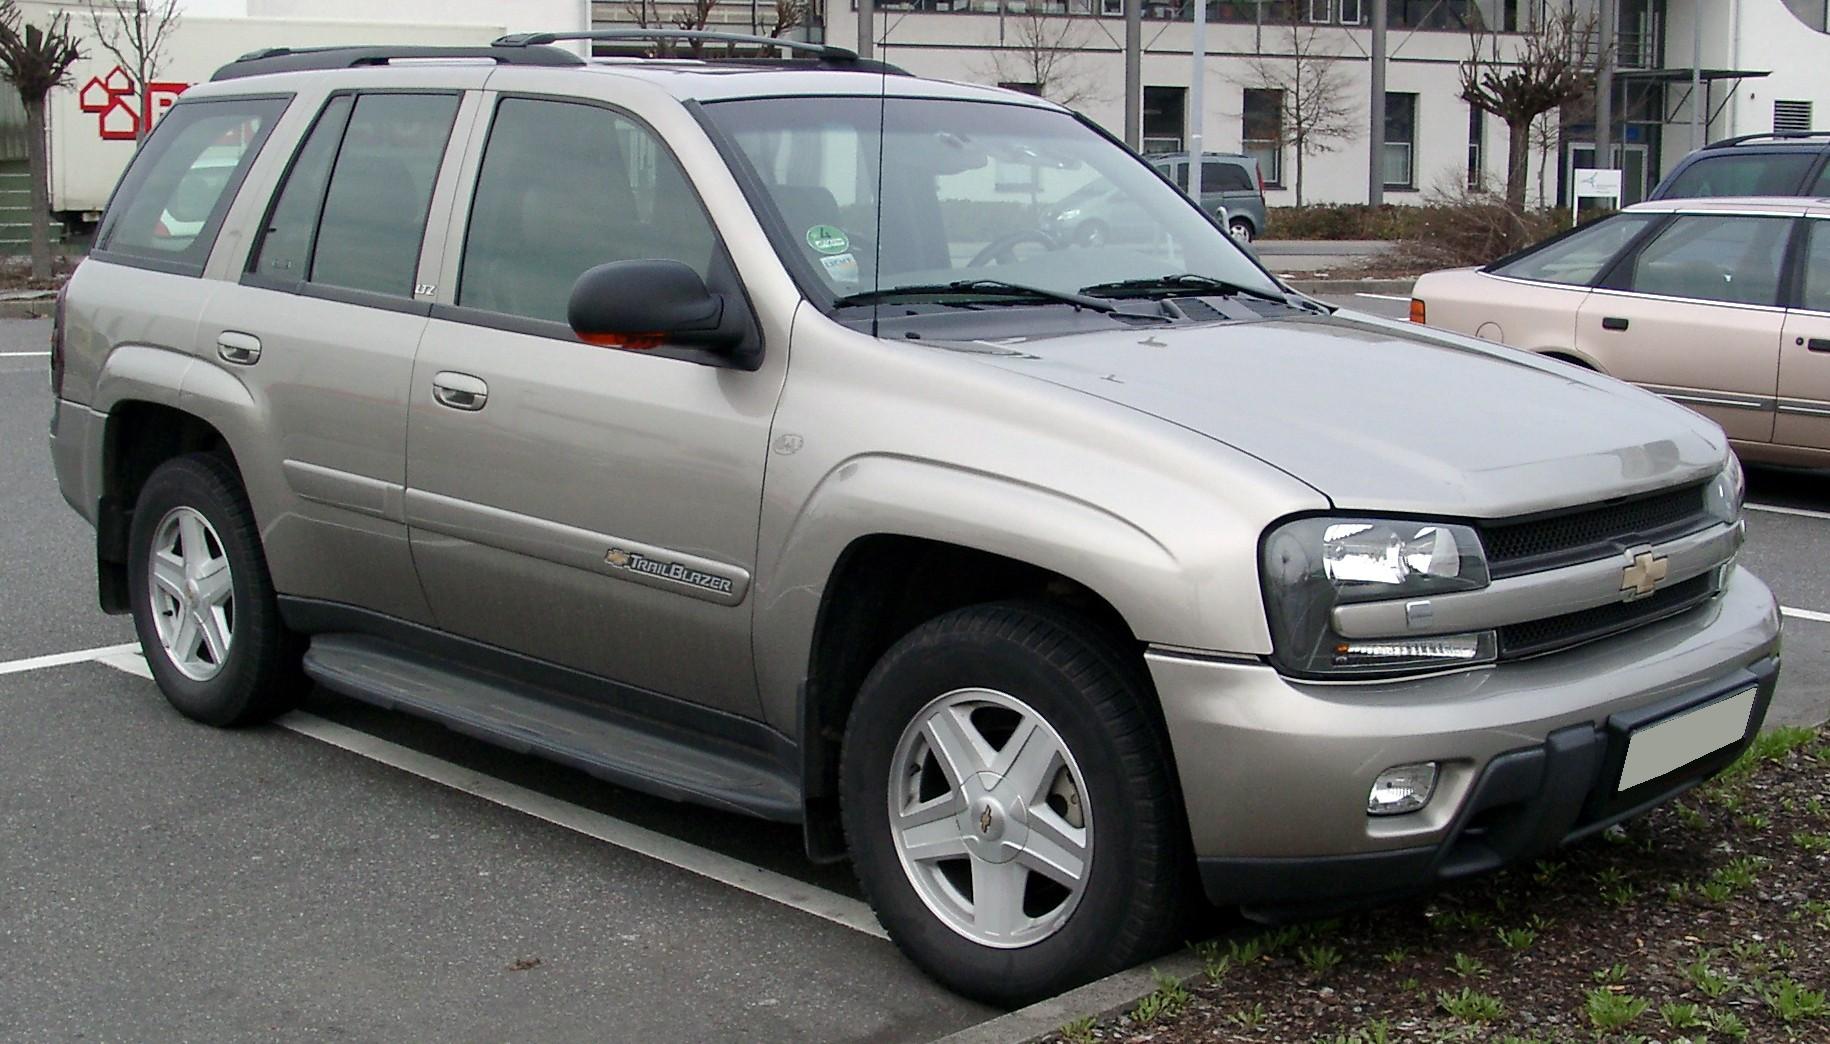 Chevrolet Trailblazer Wikipedia Den Frie Encyklop 230 Di